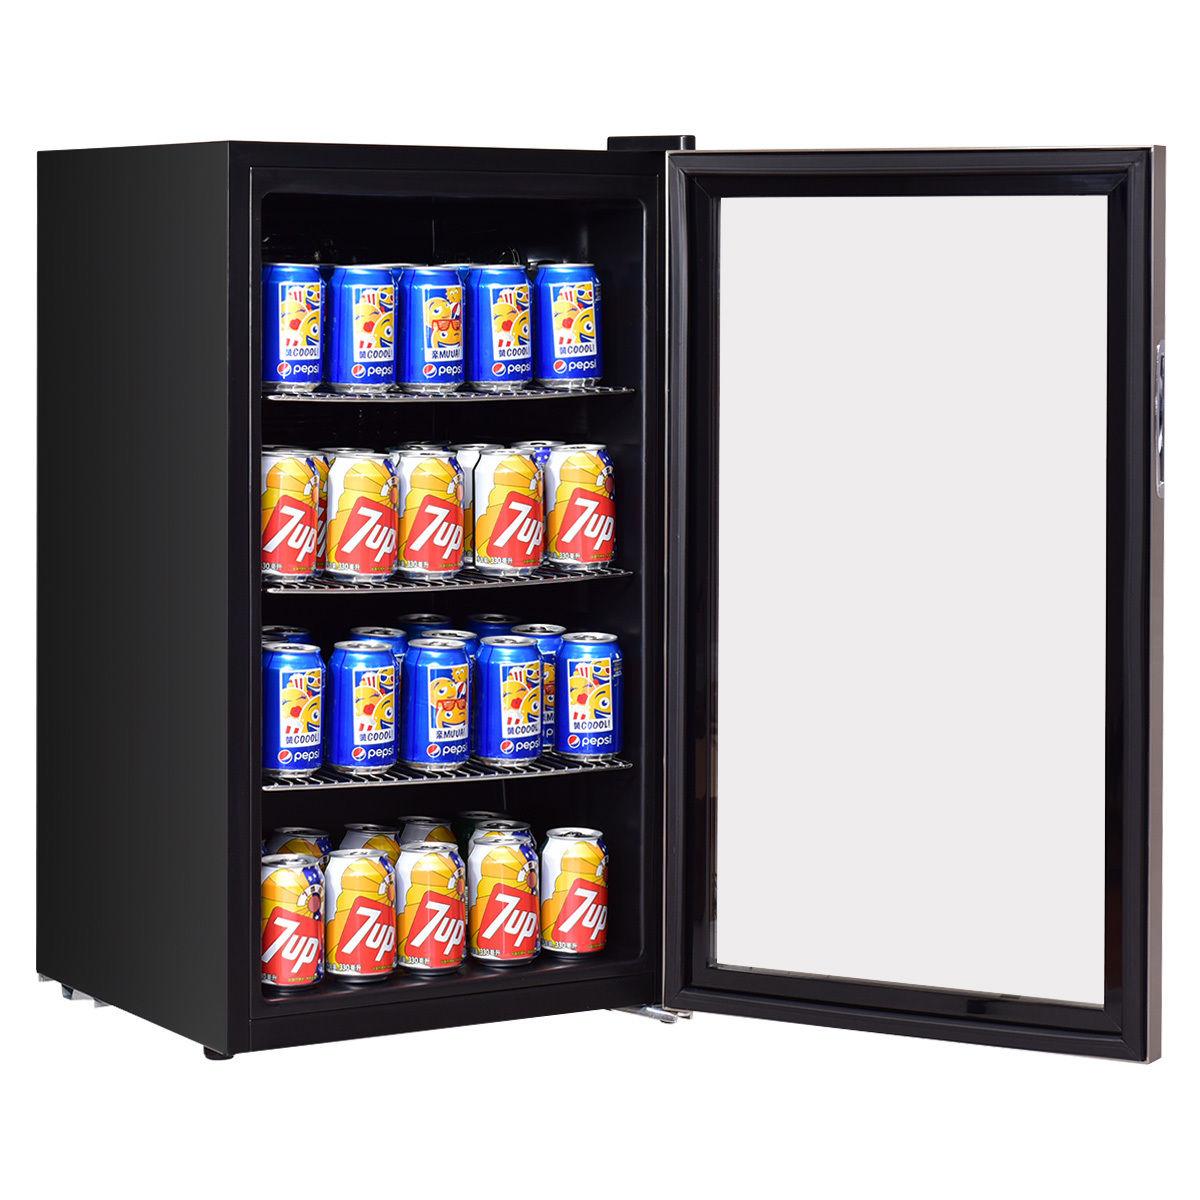 Costway 120 Can Beverage Refrigerator Beer Wine Soda Drink Cooler